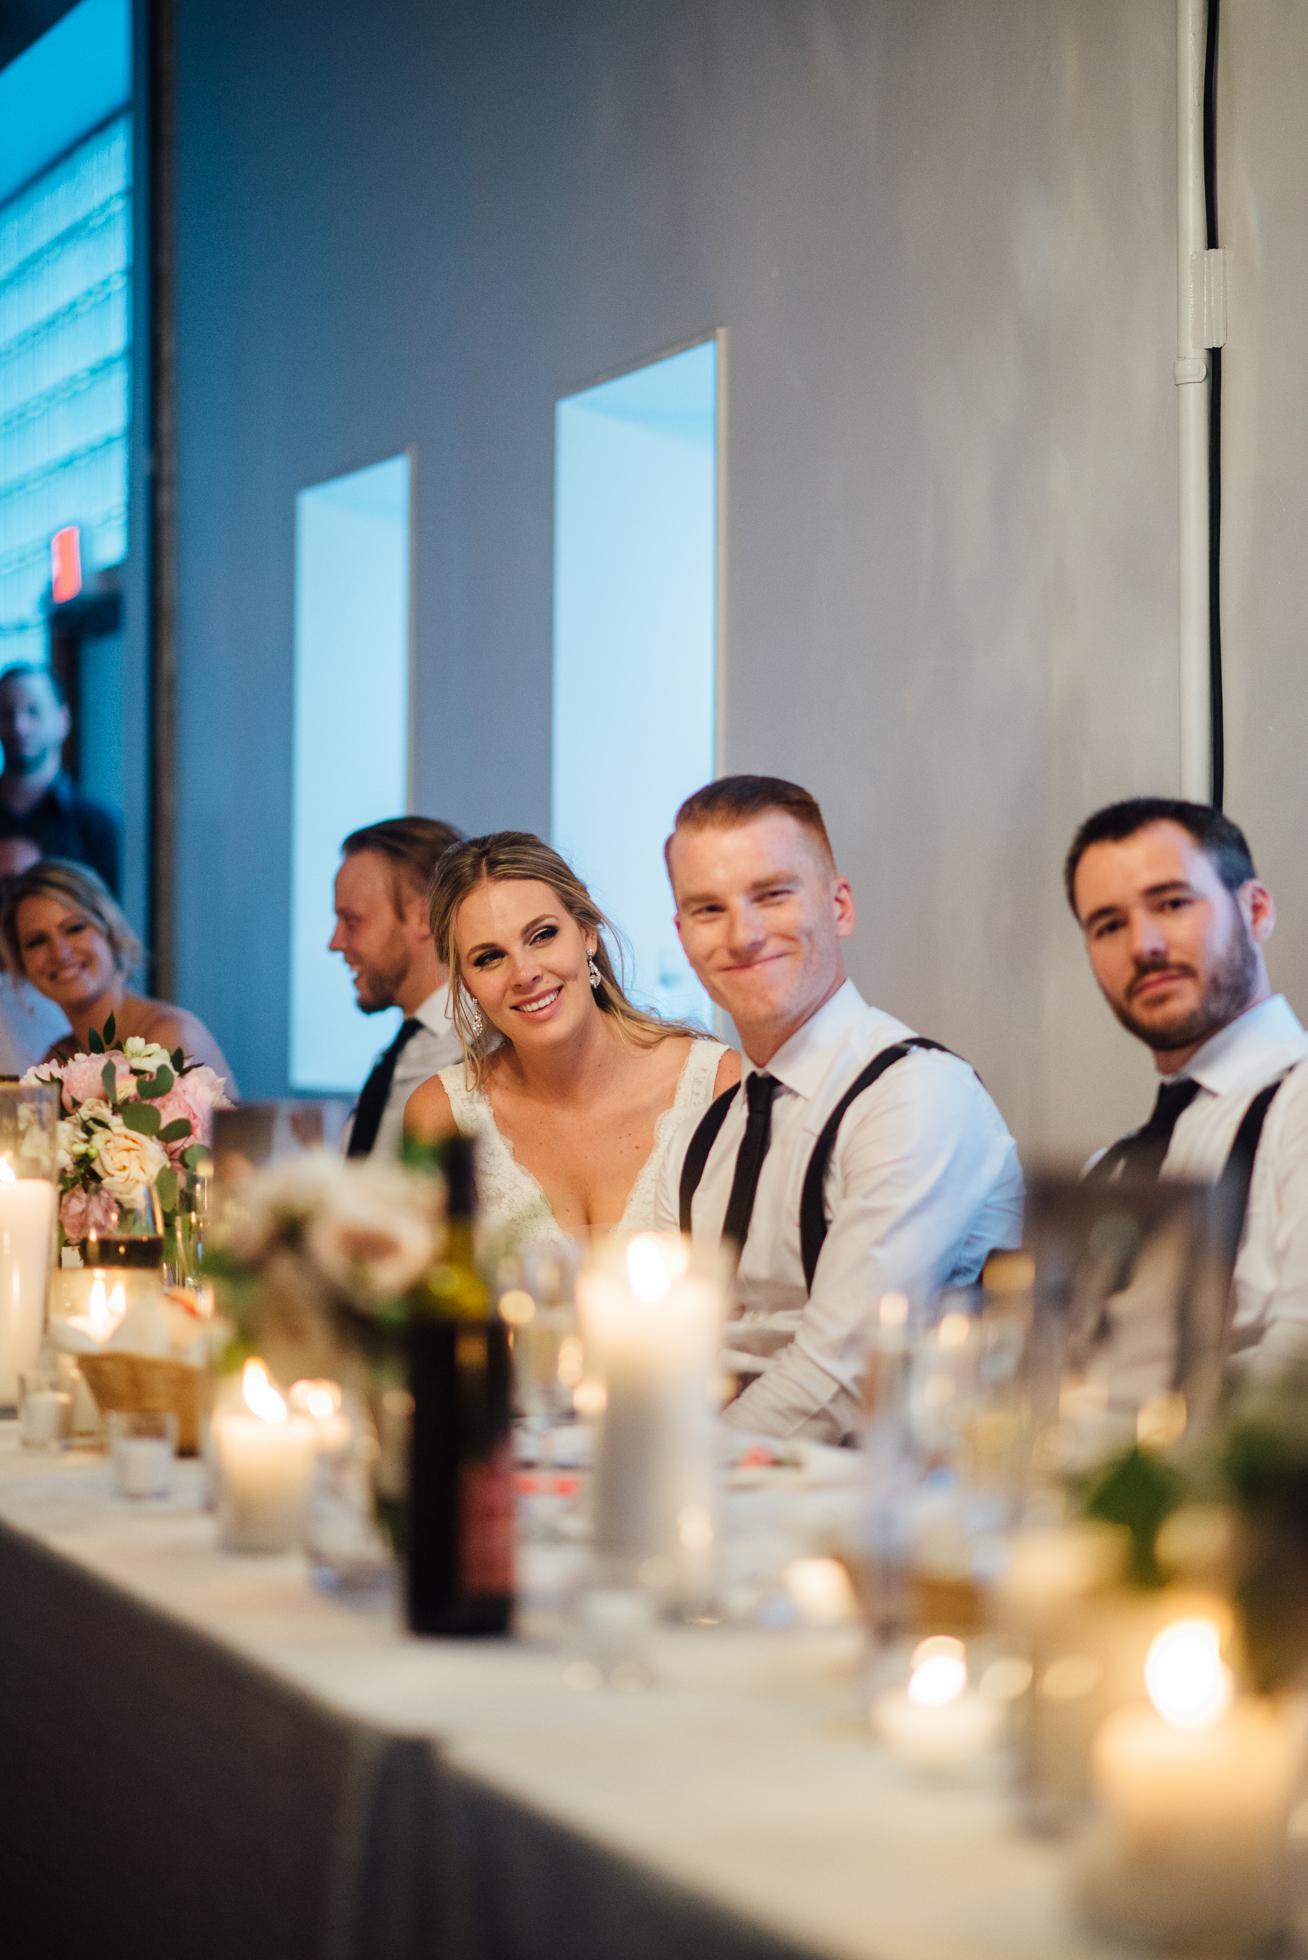 99-Sudbury-Toronto-Wedding-Photography-61.jpg